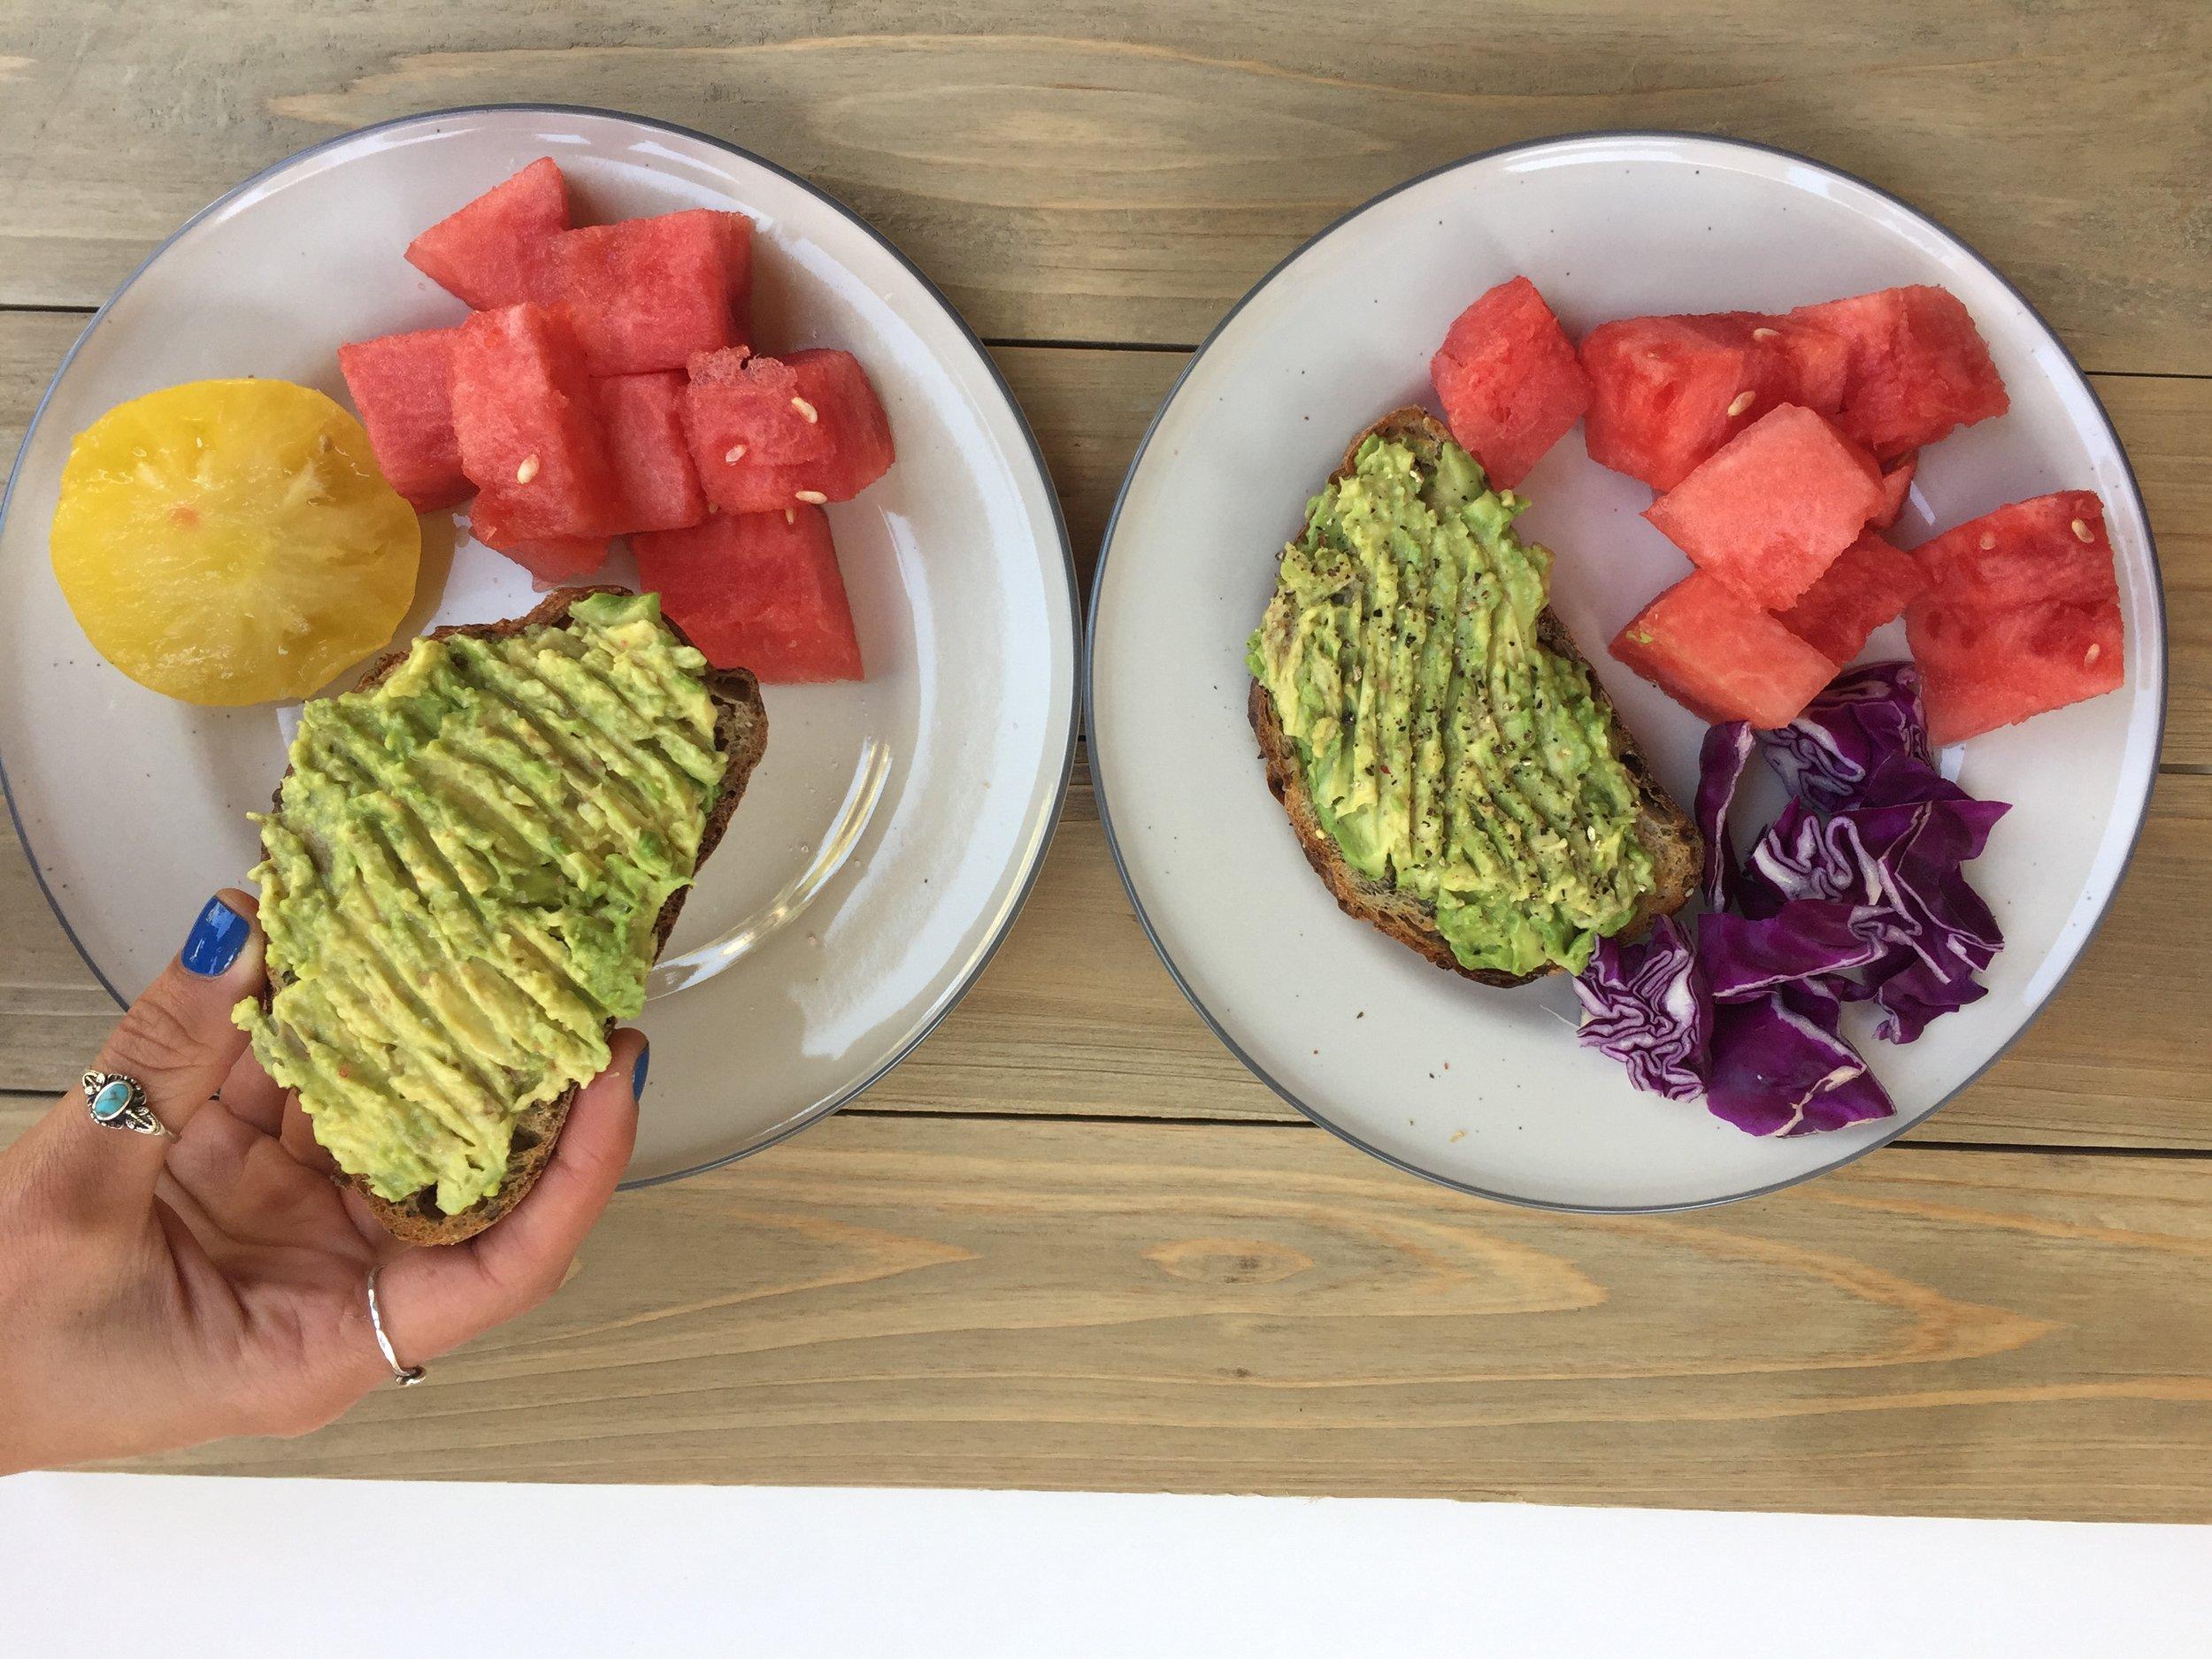 avocado toast + fresh watermelon + purple cabbage + homegrown yellow tomato, all shared with @sweatysweetpotato